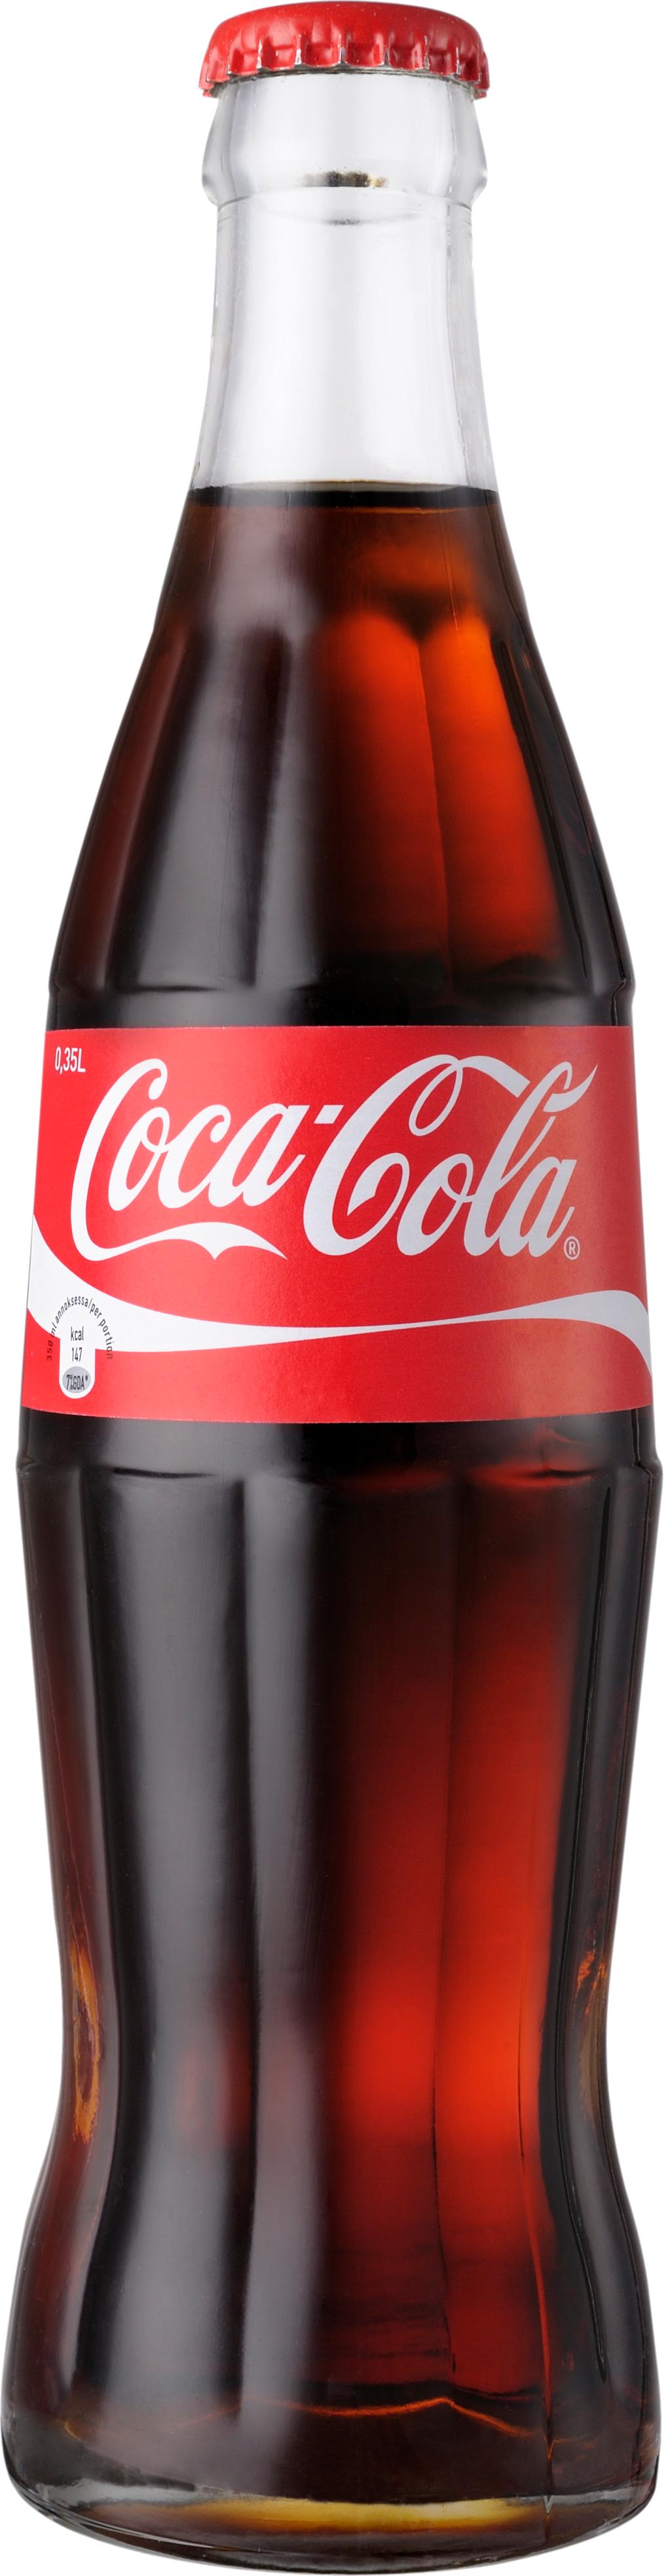 Coca Cola Bottle PNG Image